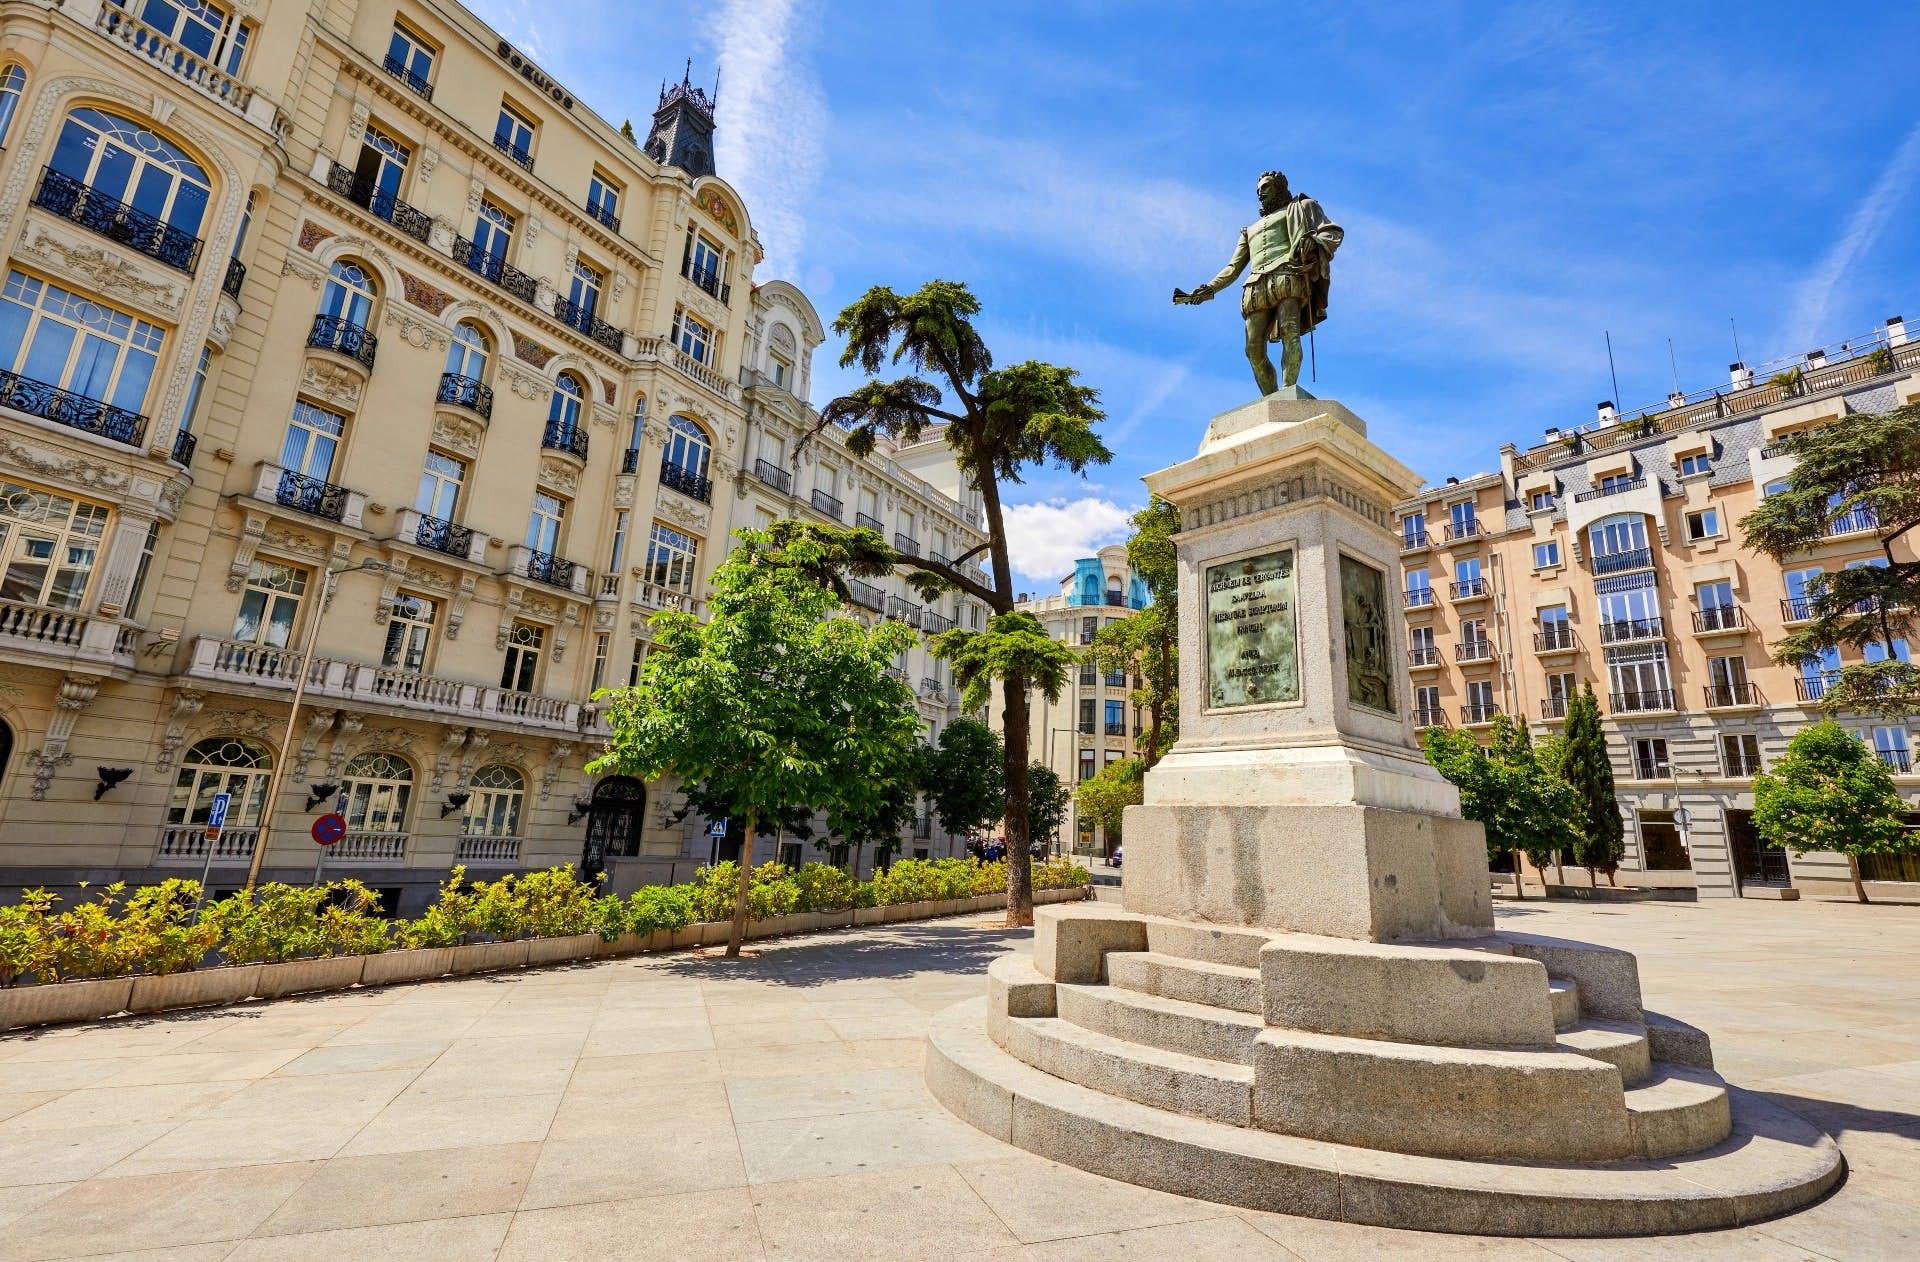 Hidden Gems of Madrid: Don Quixote image